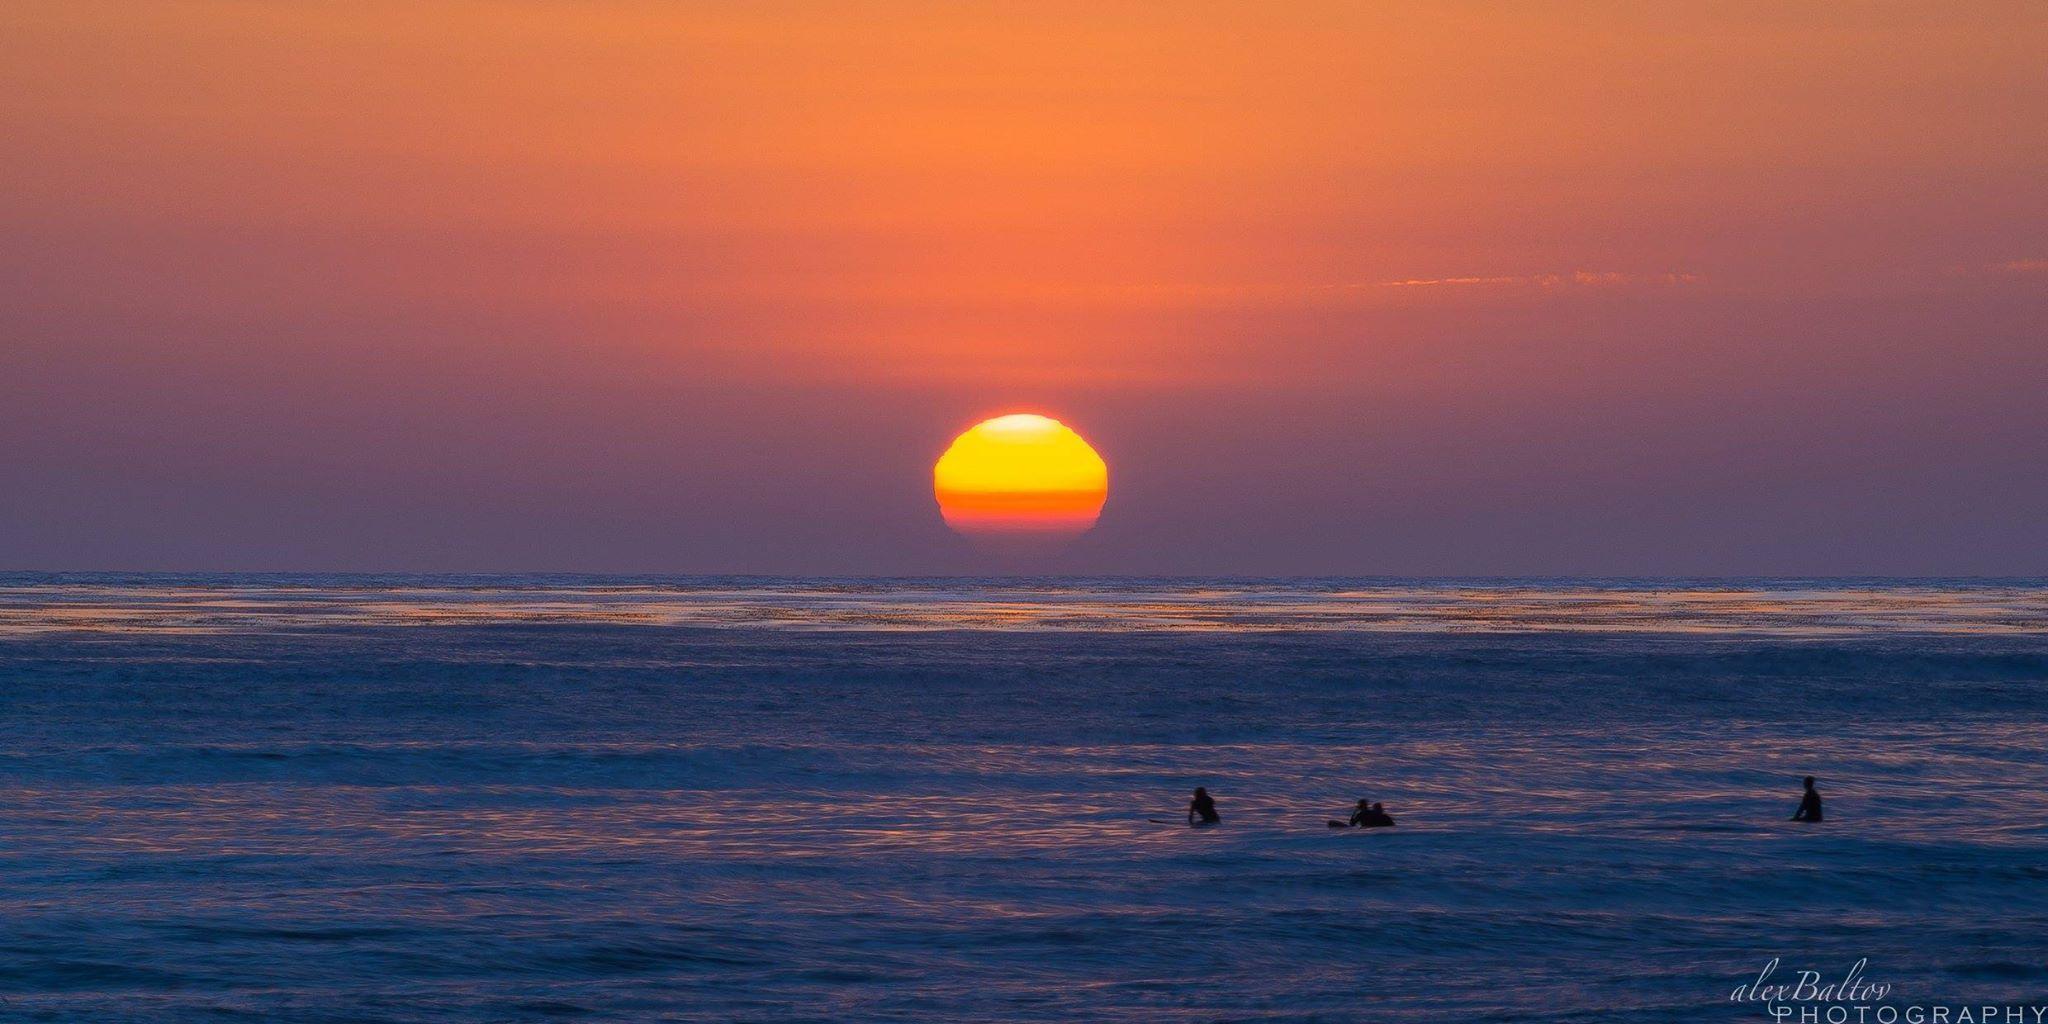 Alex Baltov Photography   -    Tonight's sunset at Windansea, La Jolla, CA ~   Summer has arrived!  6.22.15